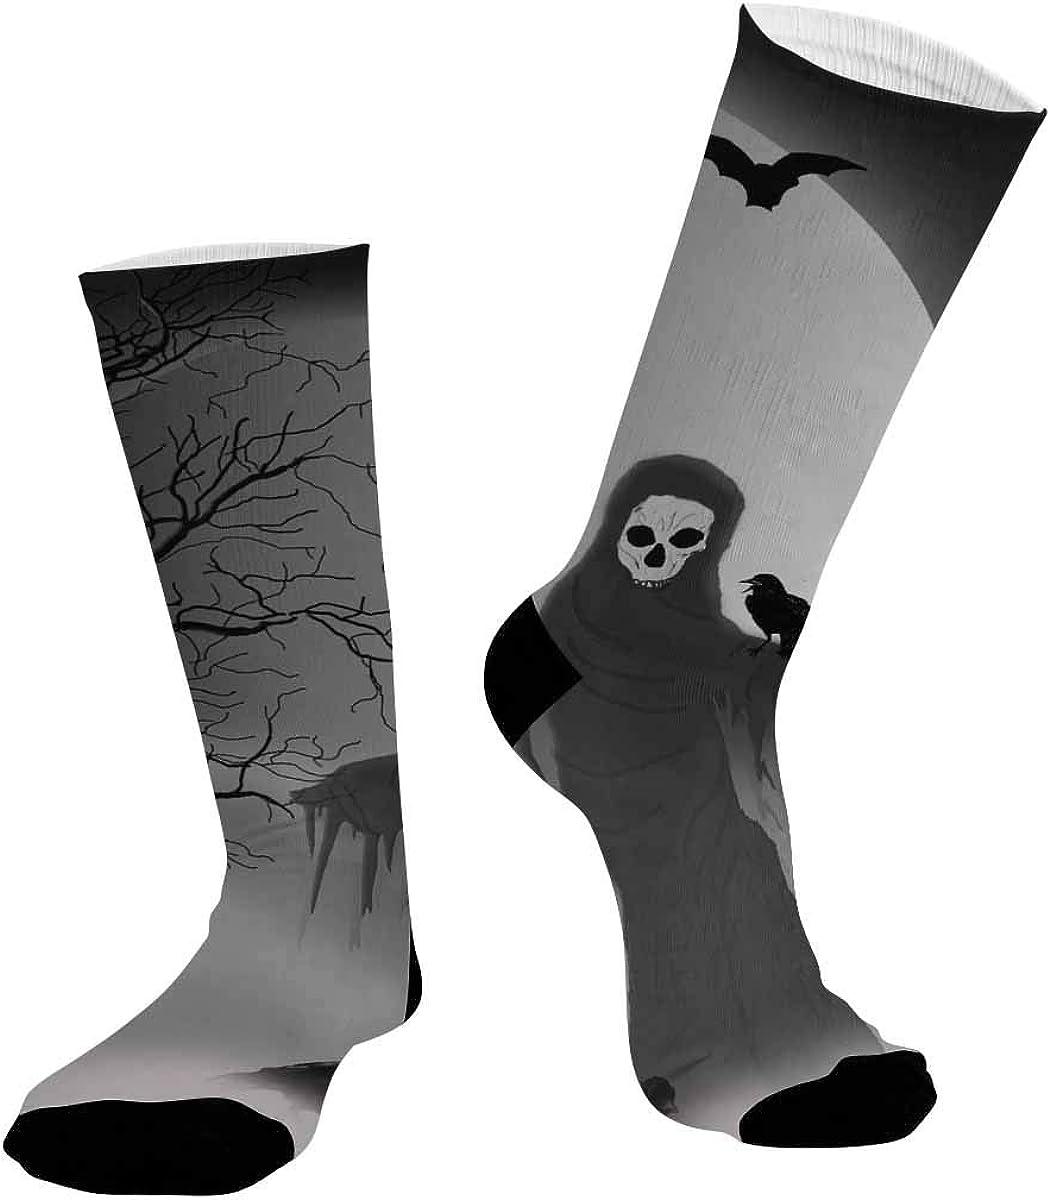 INTERESTPRINT Unisex Outdoor Sports Athletic Hiking Socks Halloween Scarecrow Kull Face